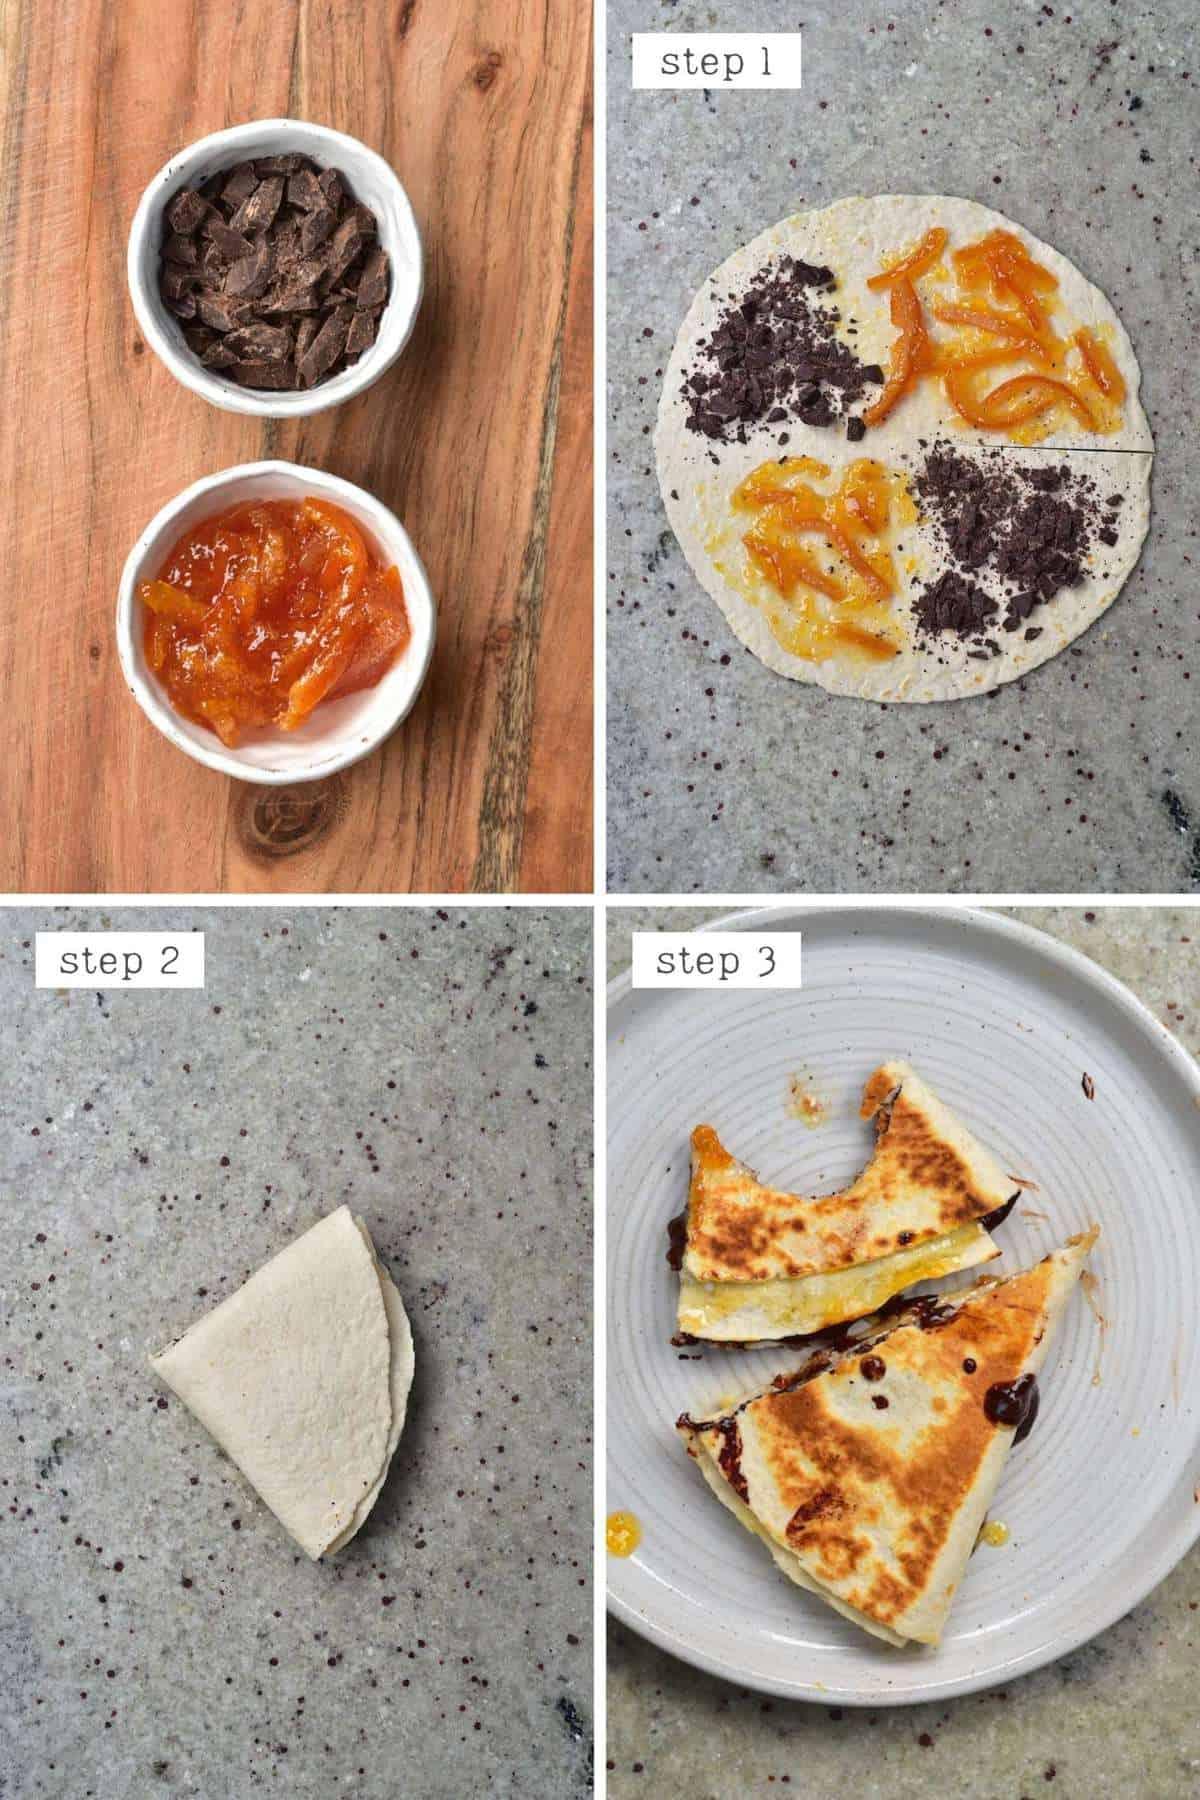 Steps for making jaffa cake tortilla